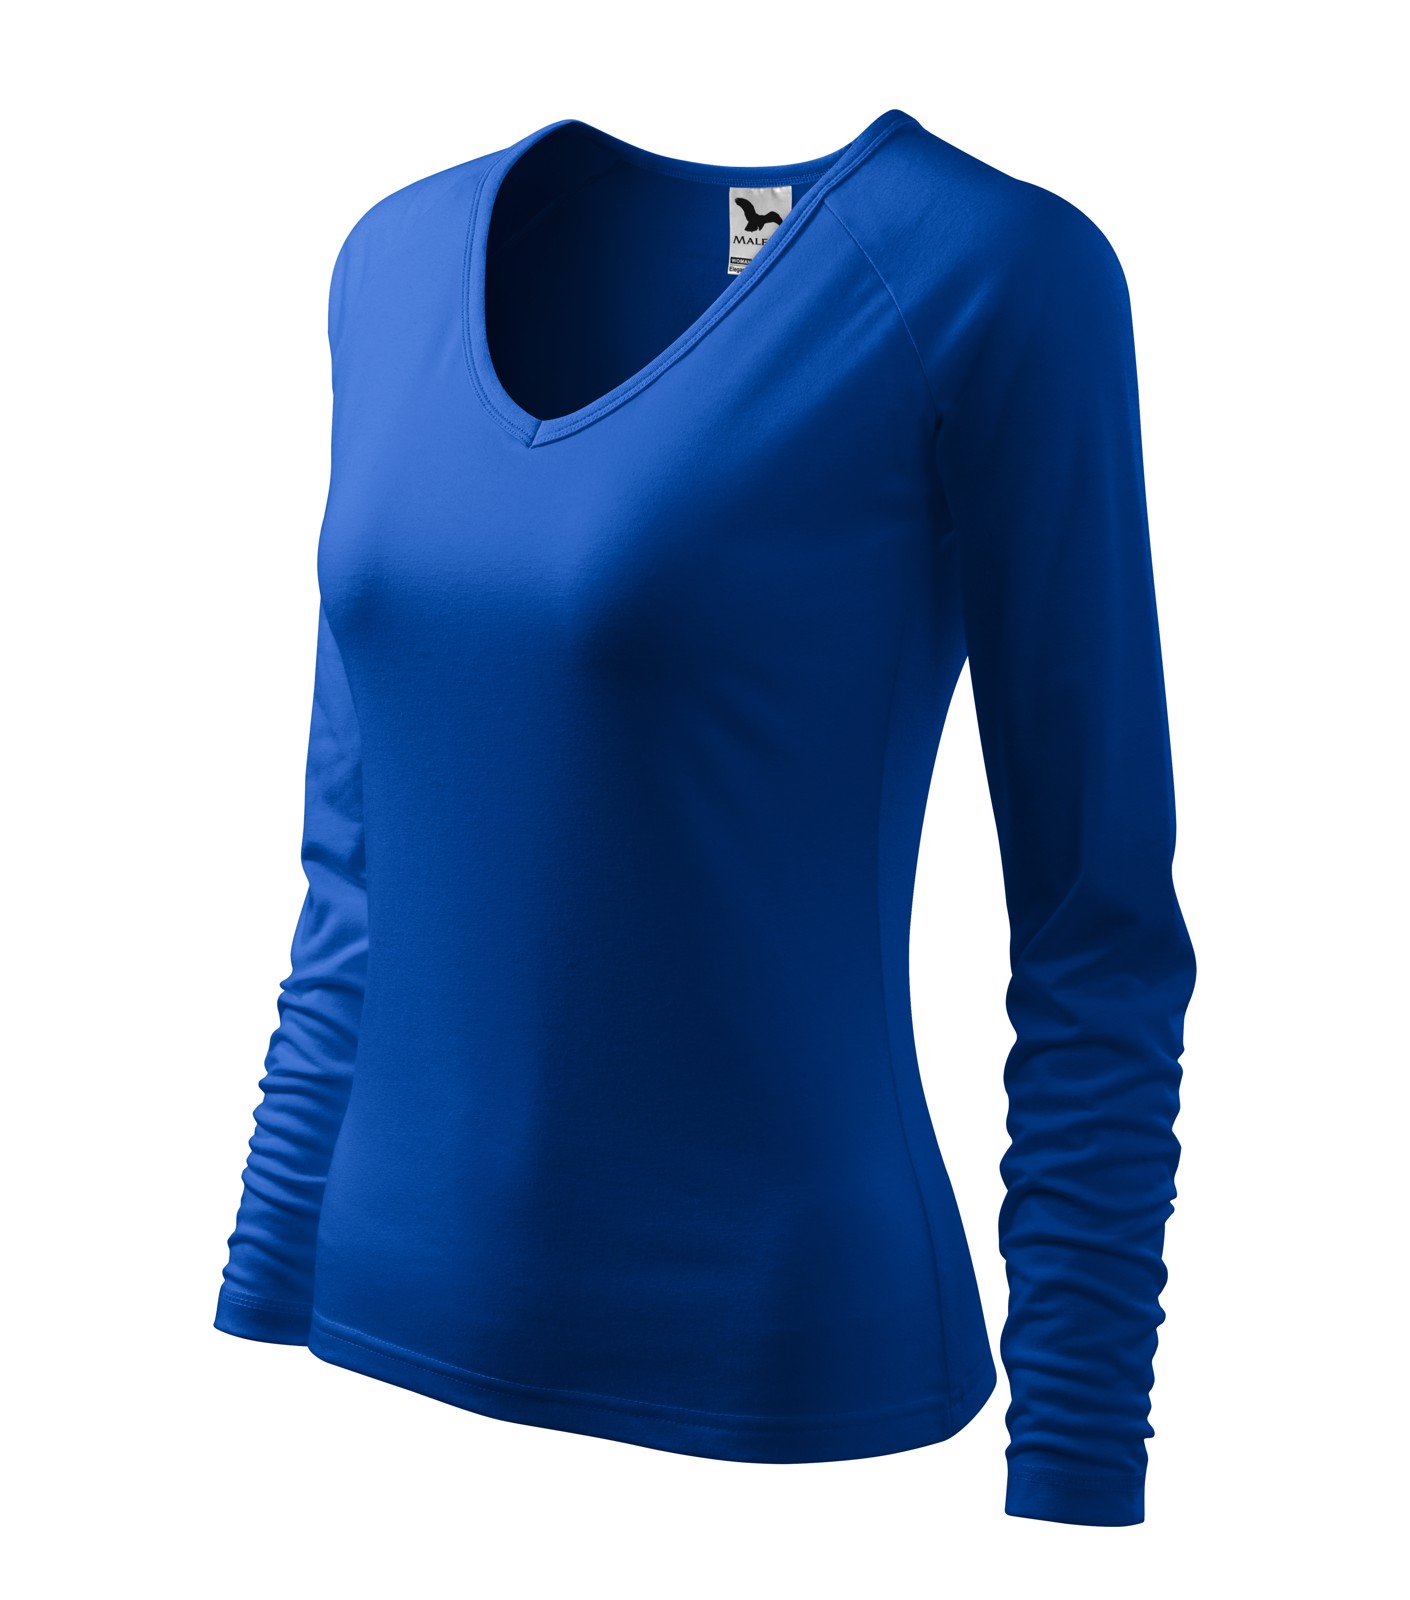 T-shirt women's Malfini Elegance - Royal Blue / L